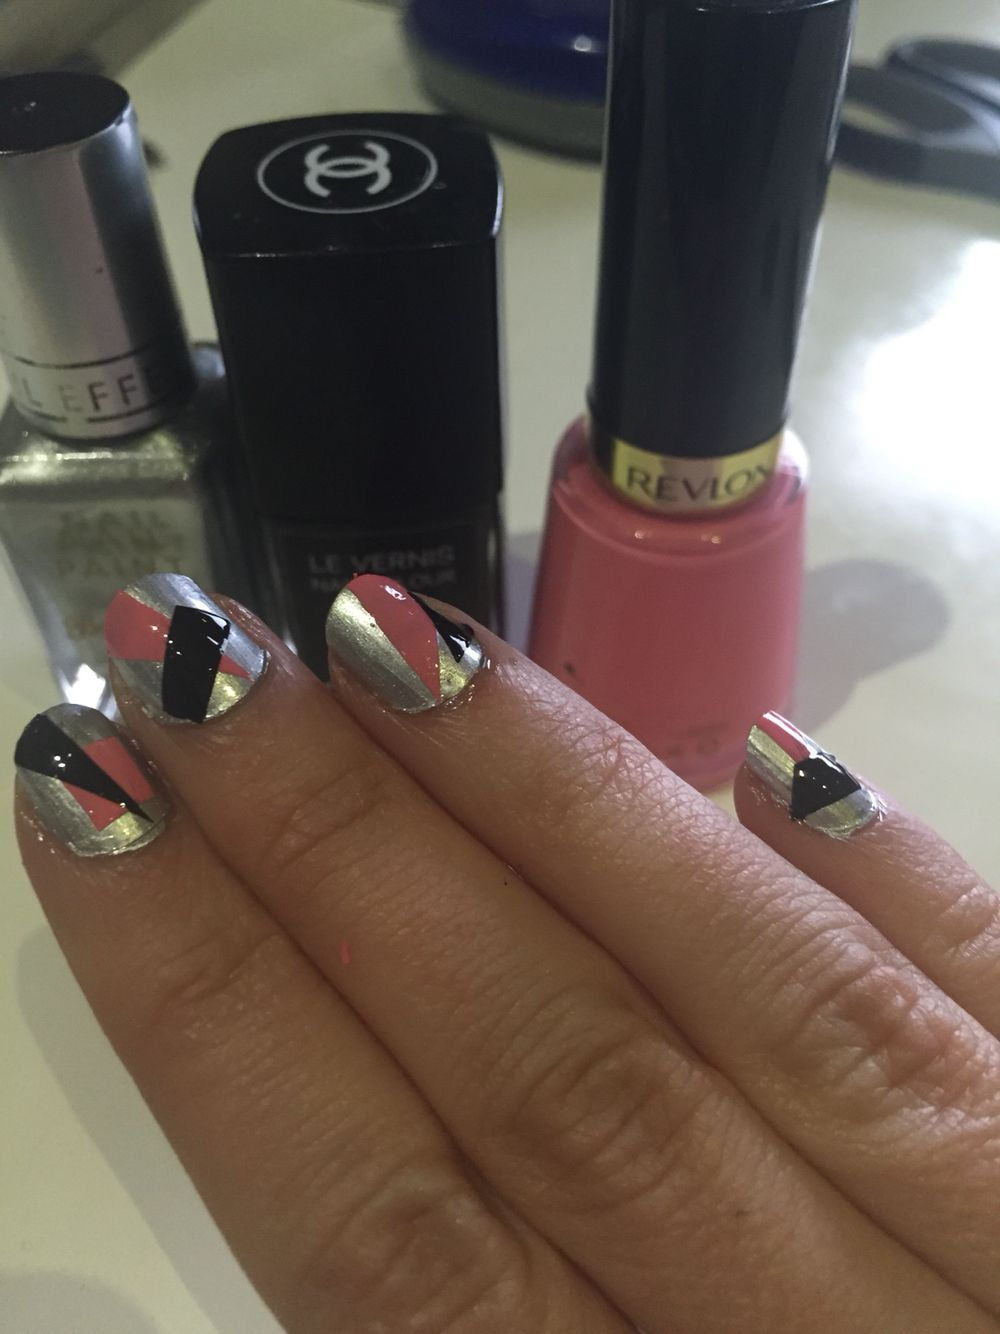 Geometric nails paint a ziplock bag wait for the polish